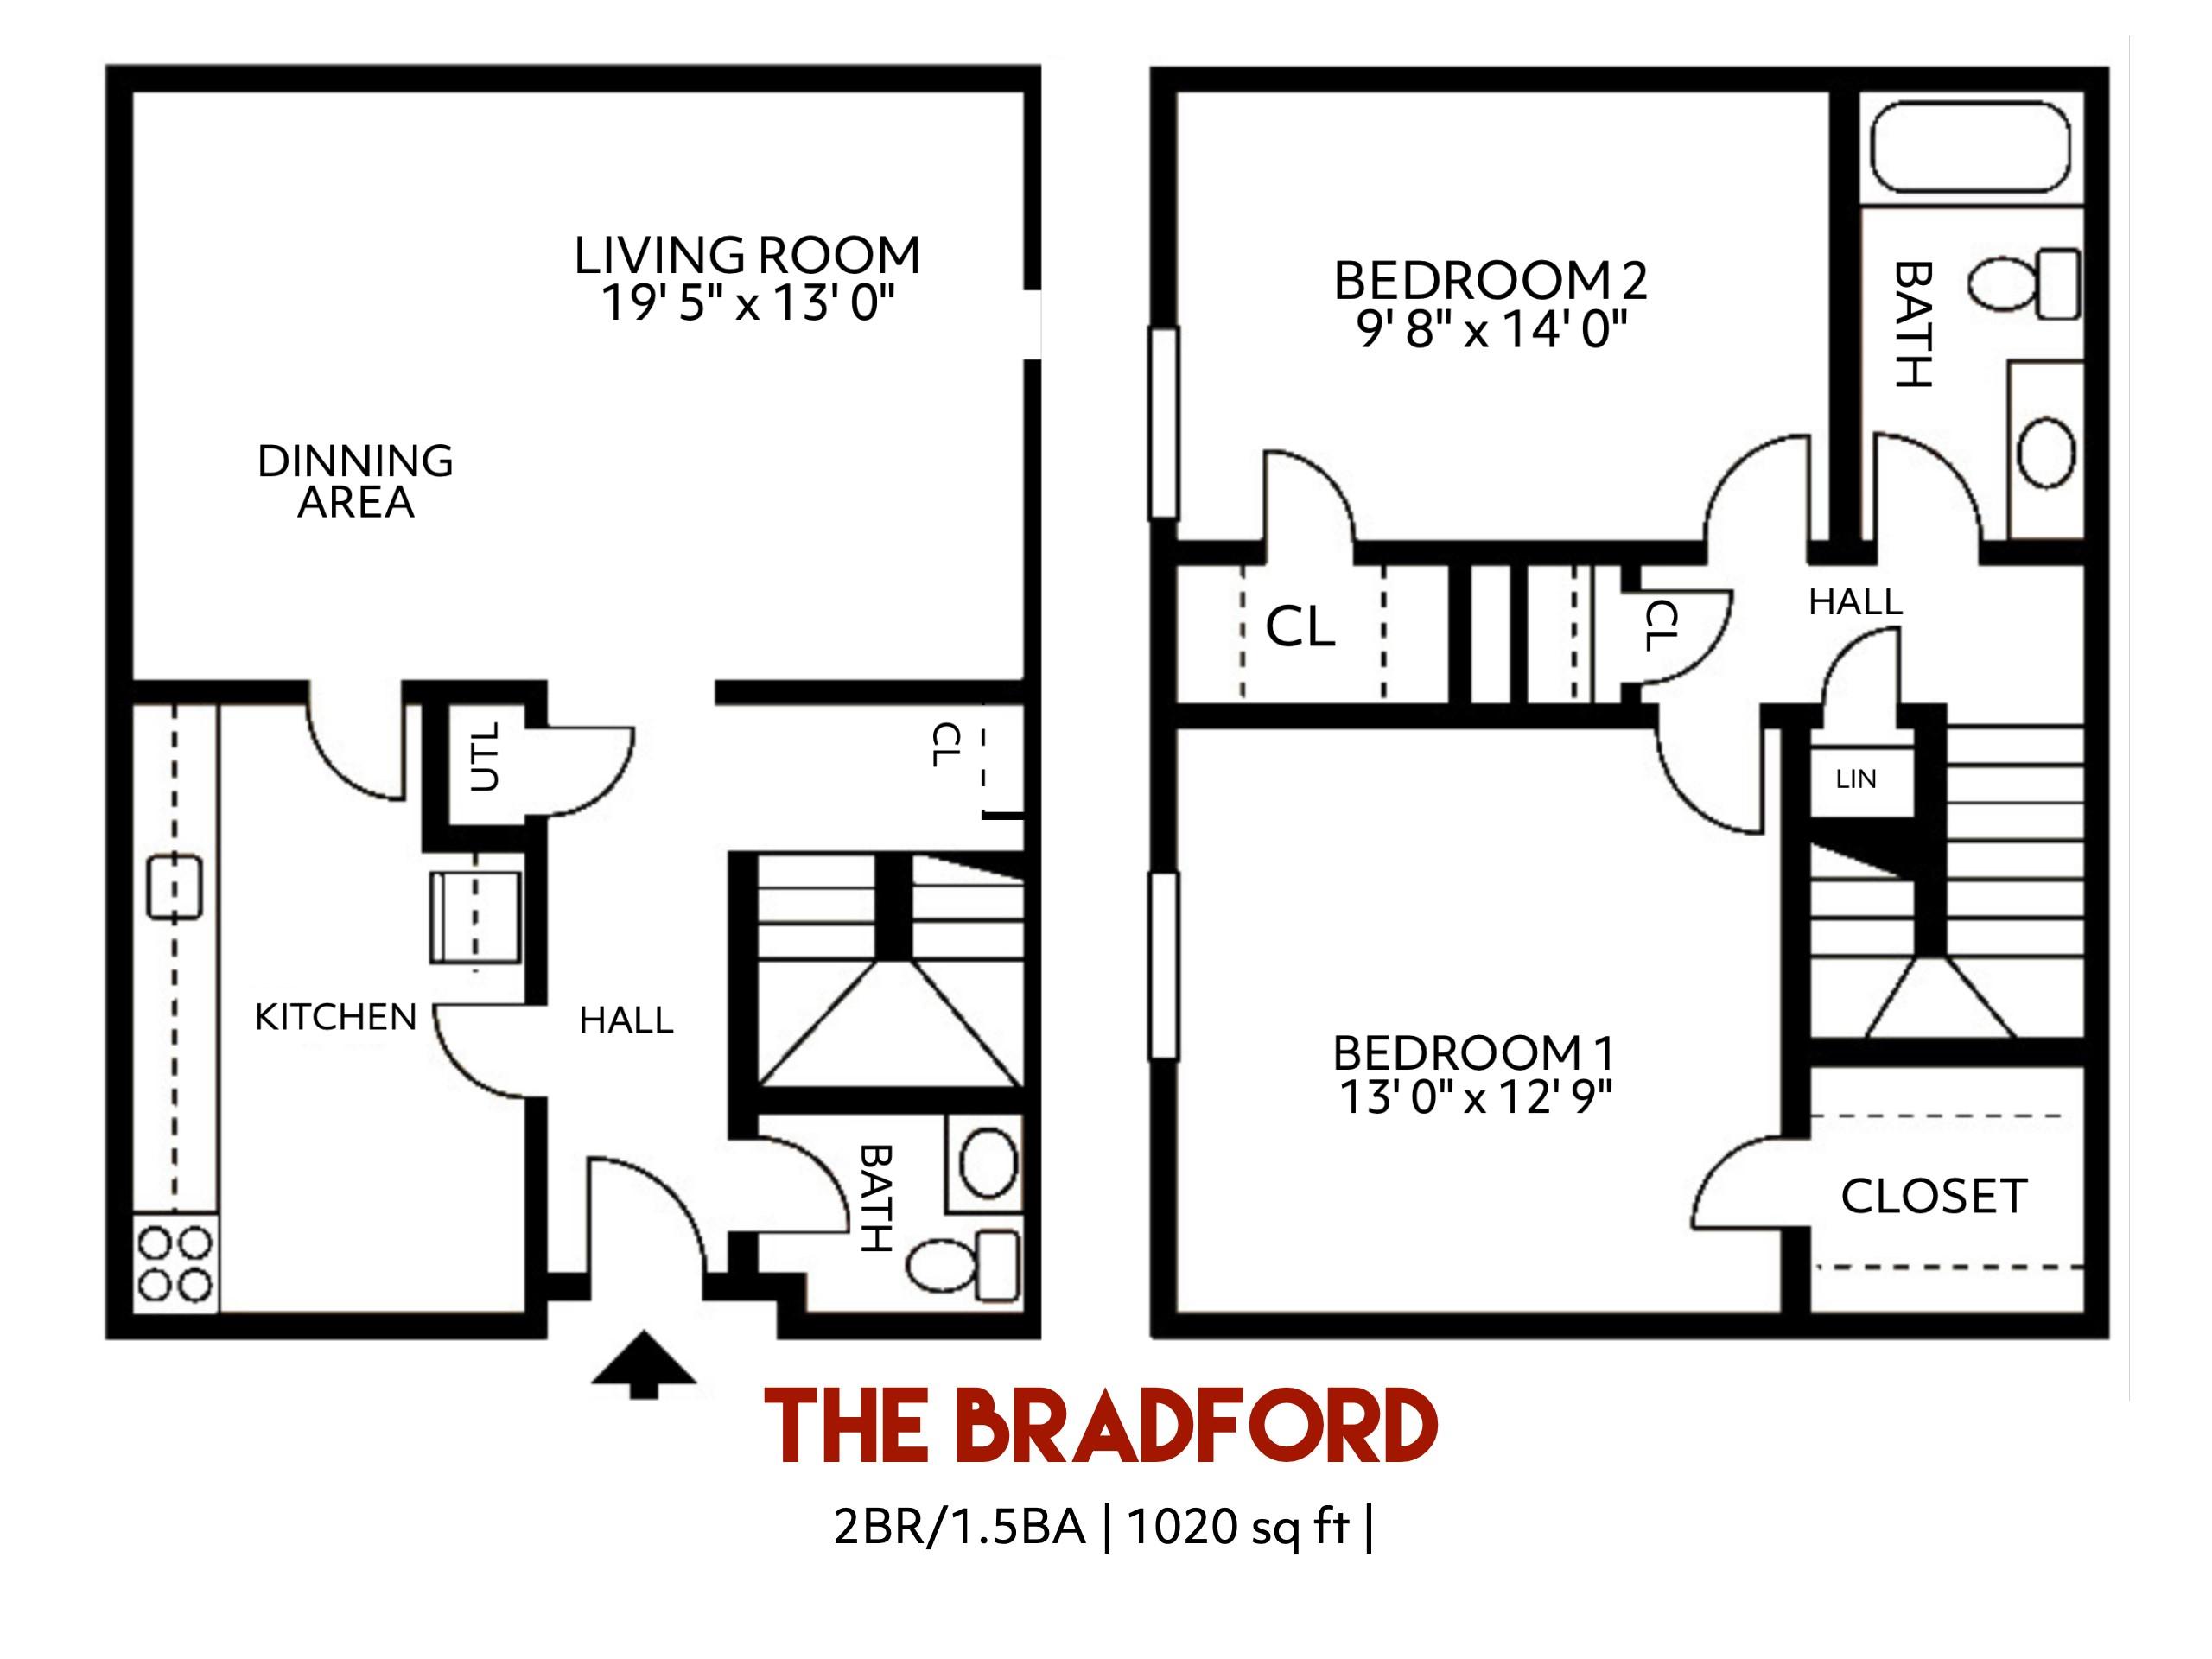 The Bradford Floorplan